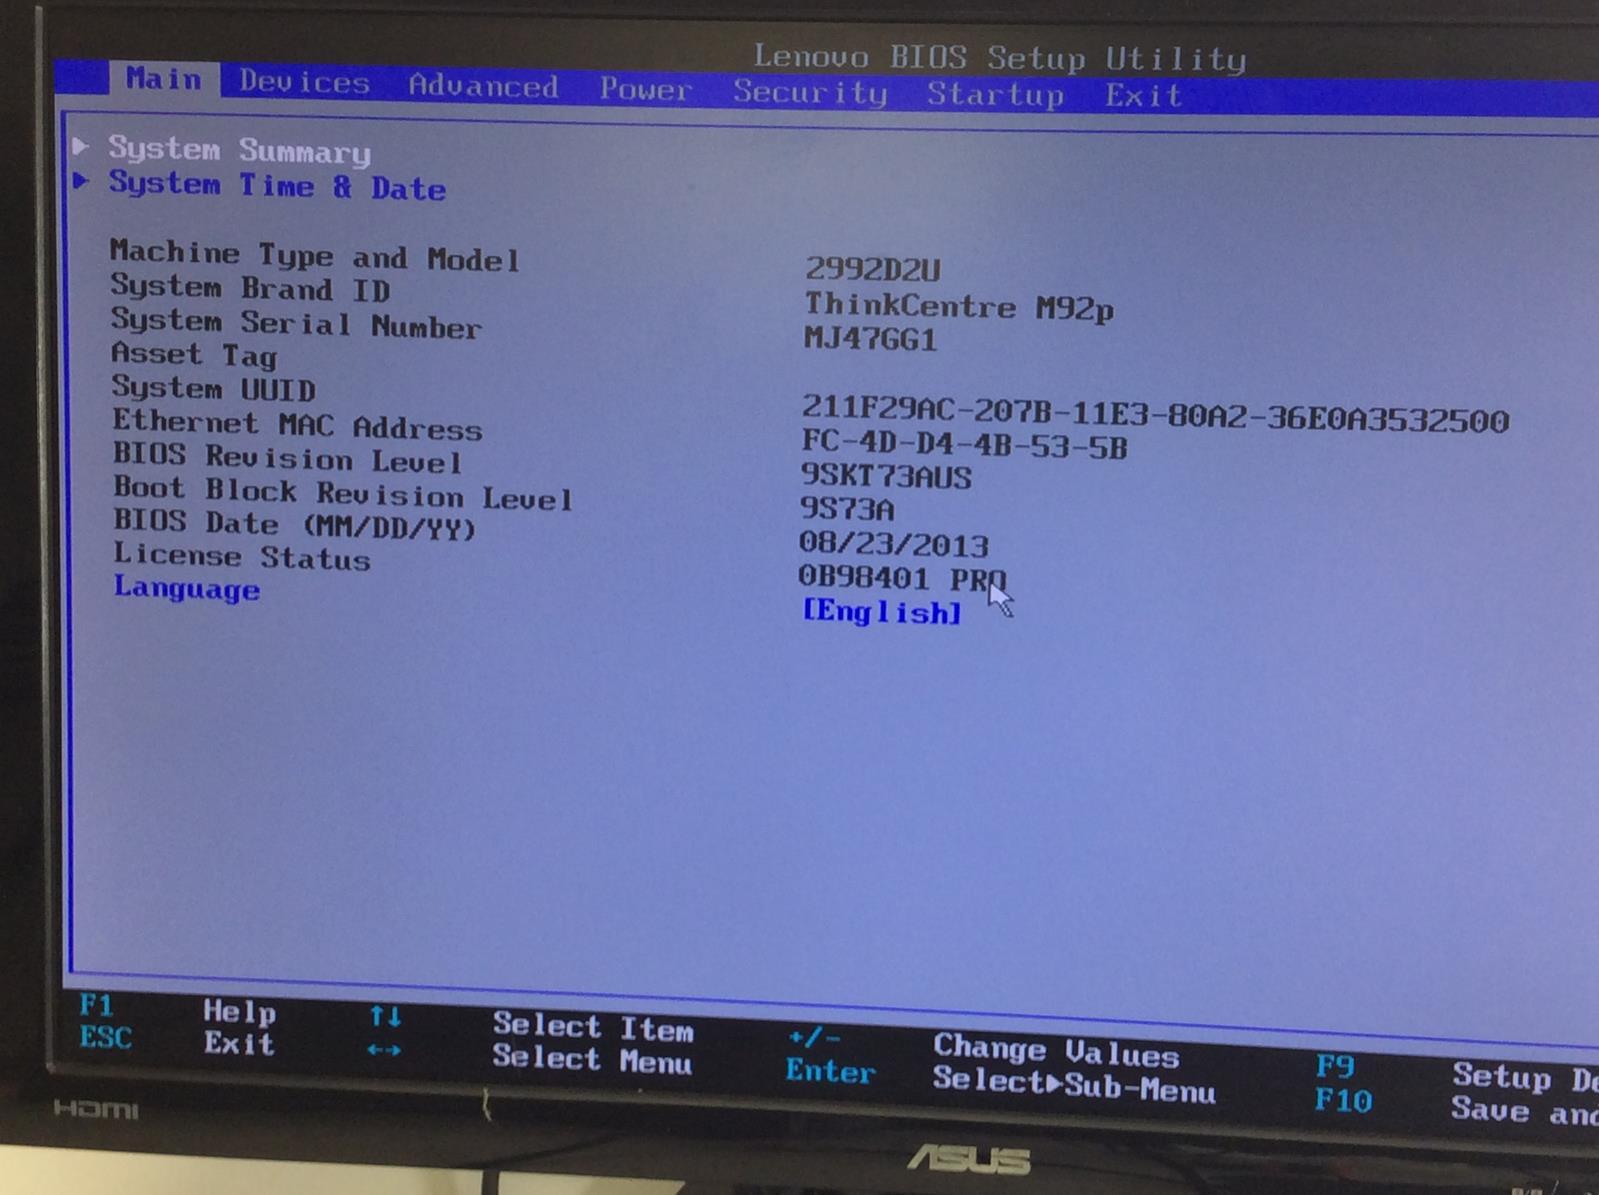 Details about LENOVO THINKCENTRE M92P Intel Core i7-3770 3 40GHZ 8GB 1TB -  Windows 10 Pro